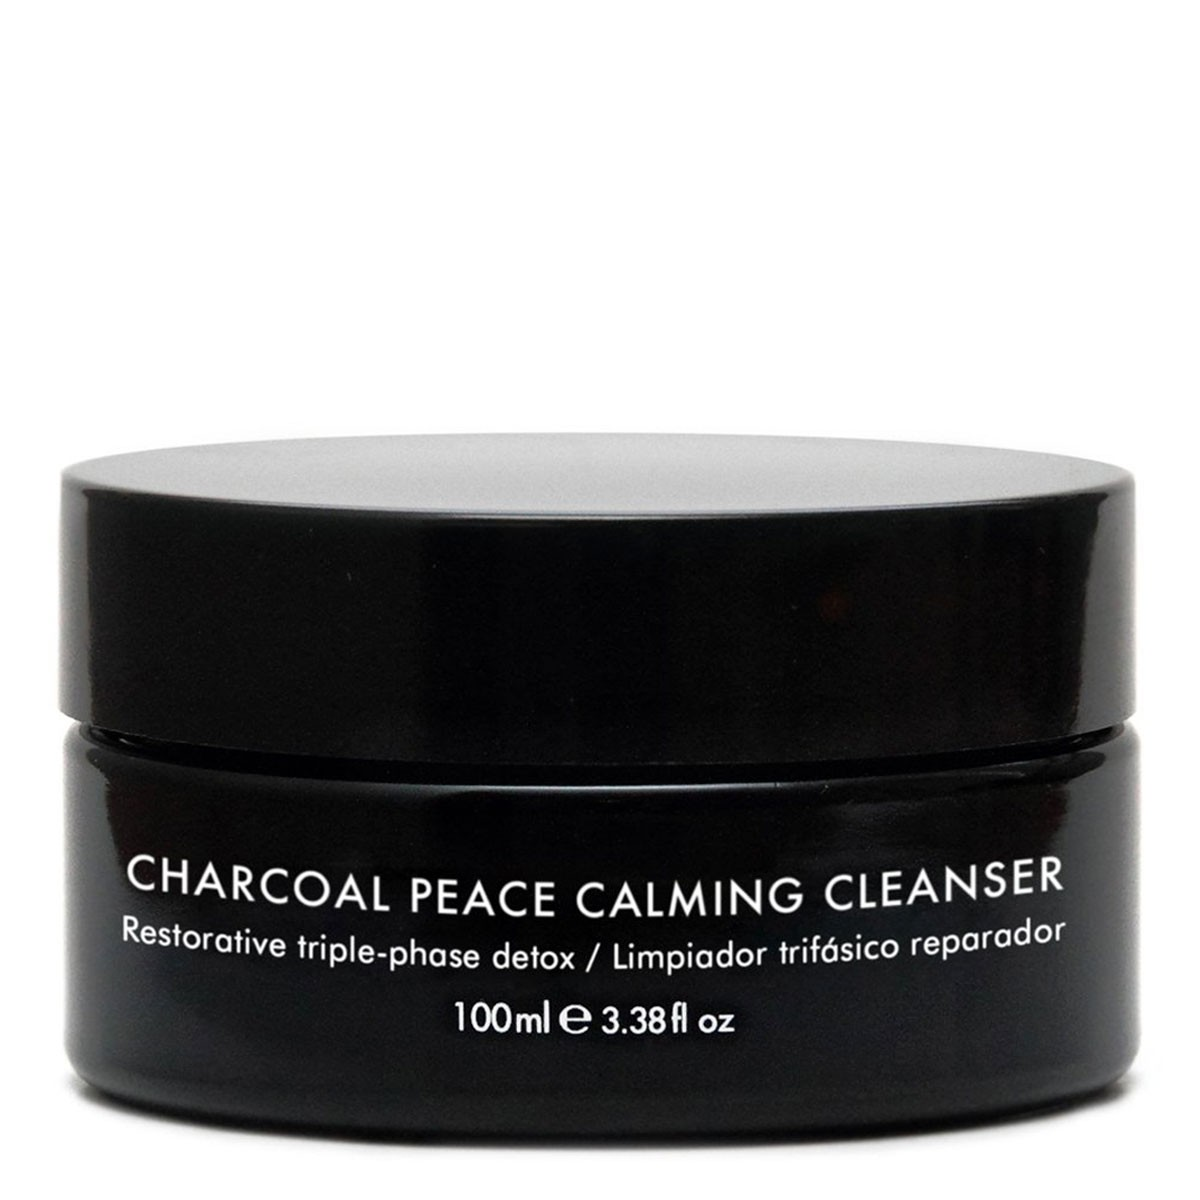 Twelve Charcoal Peace Calming Cleanser - limpiador carbon activado